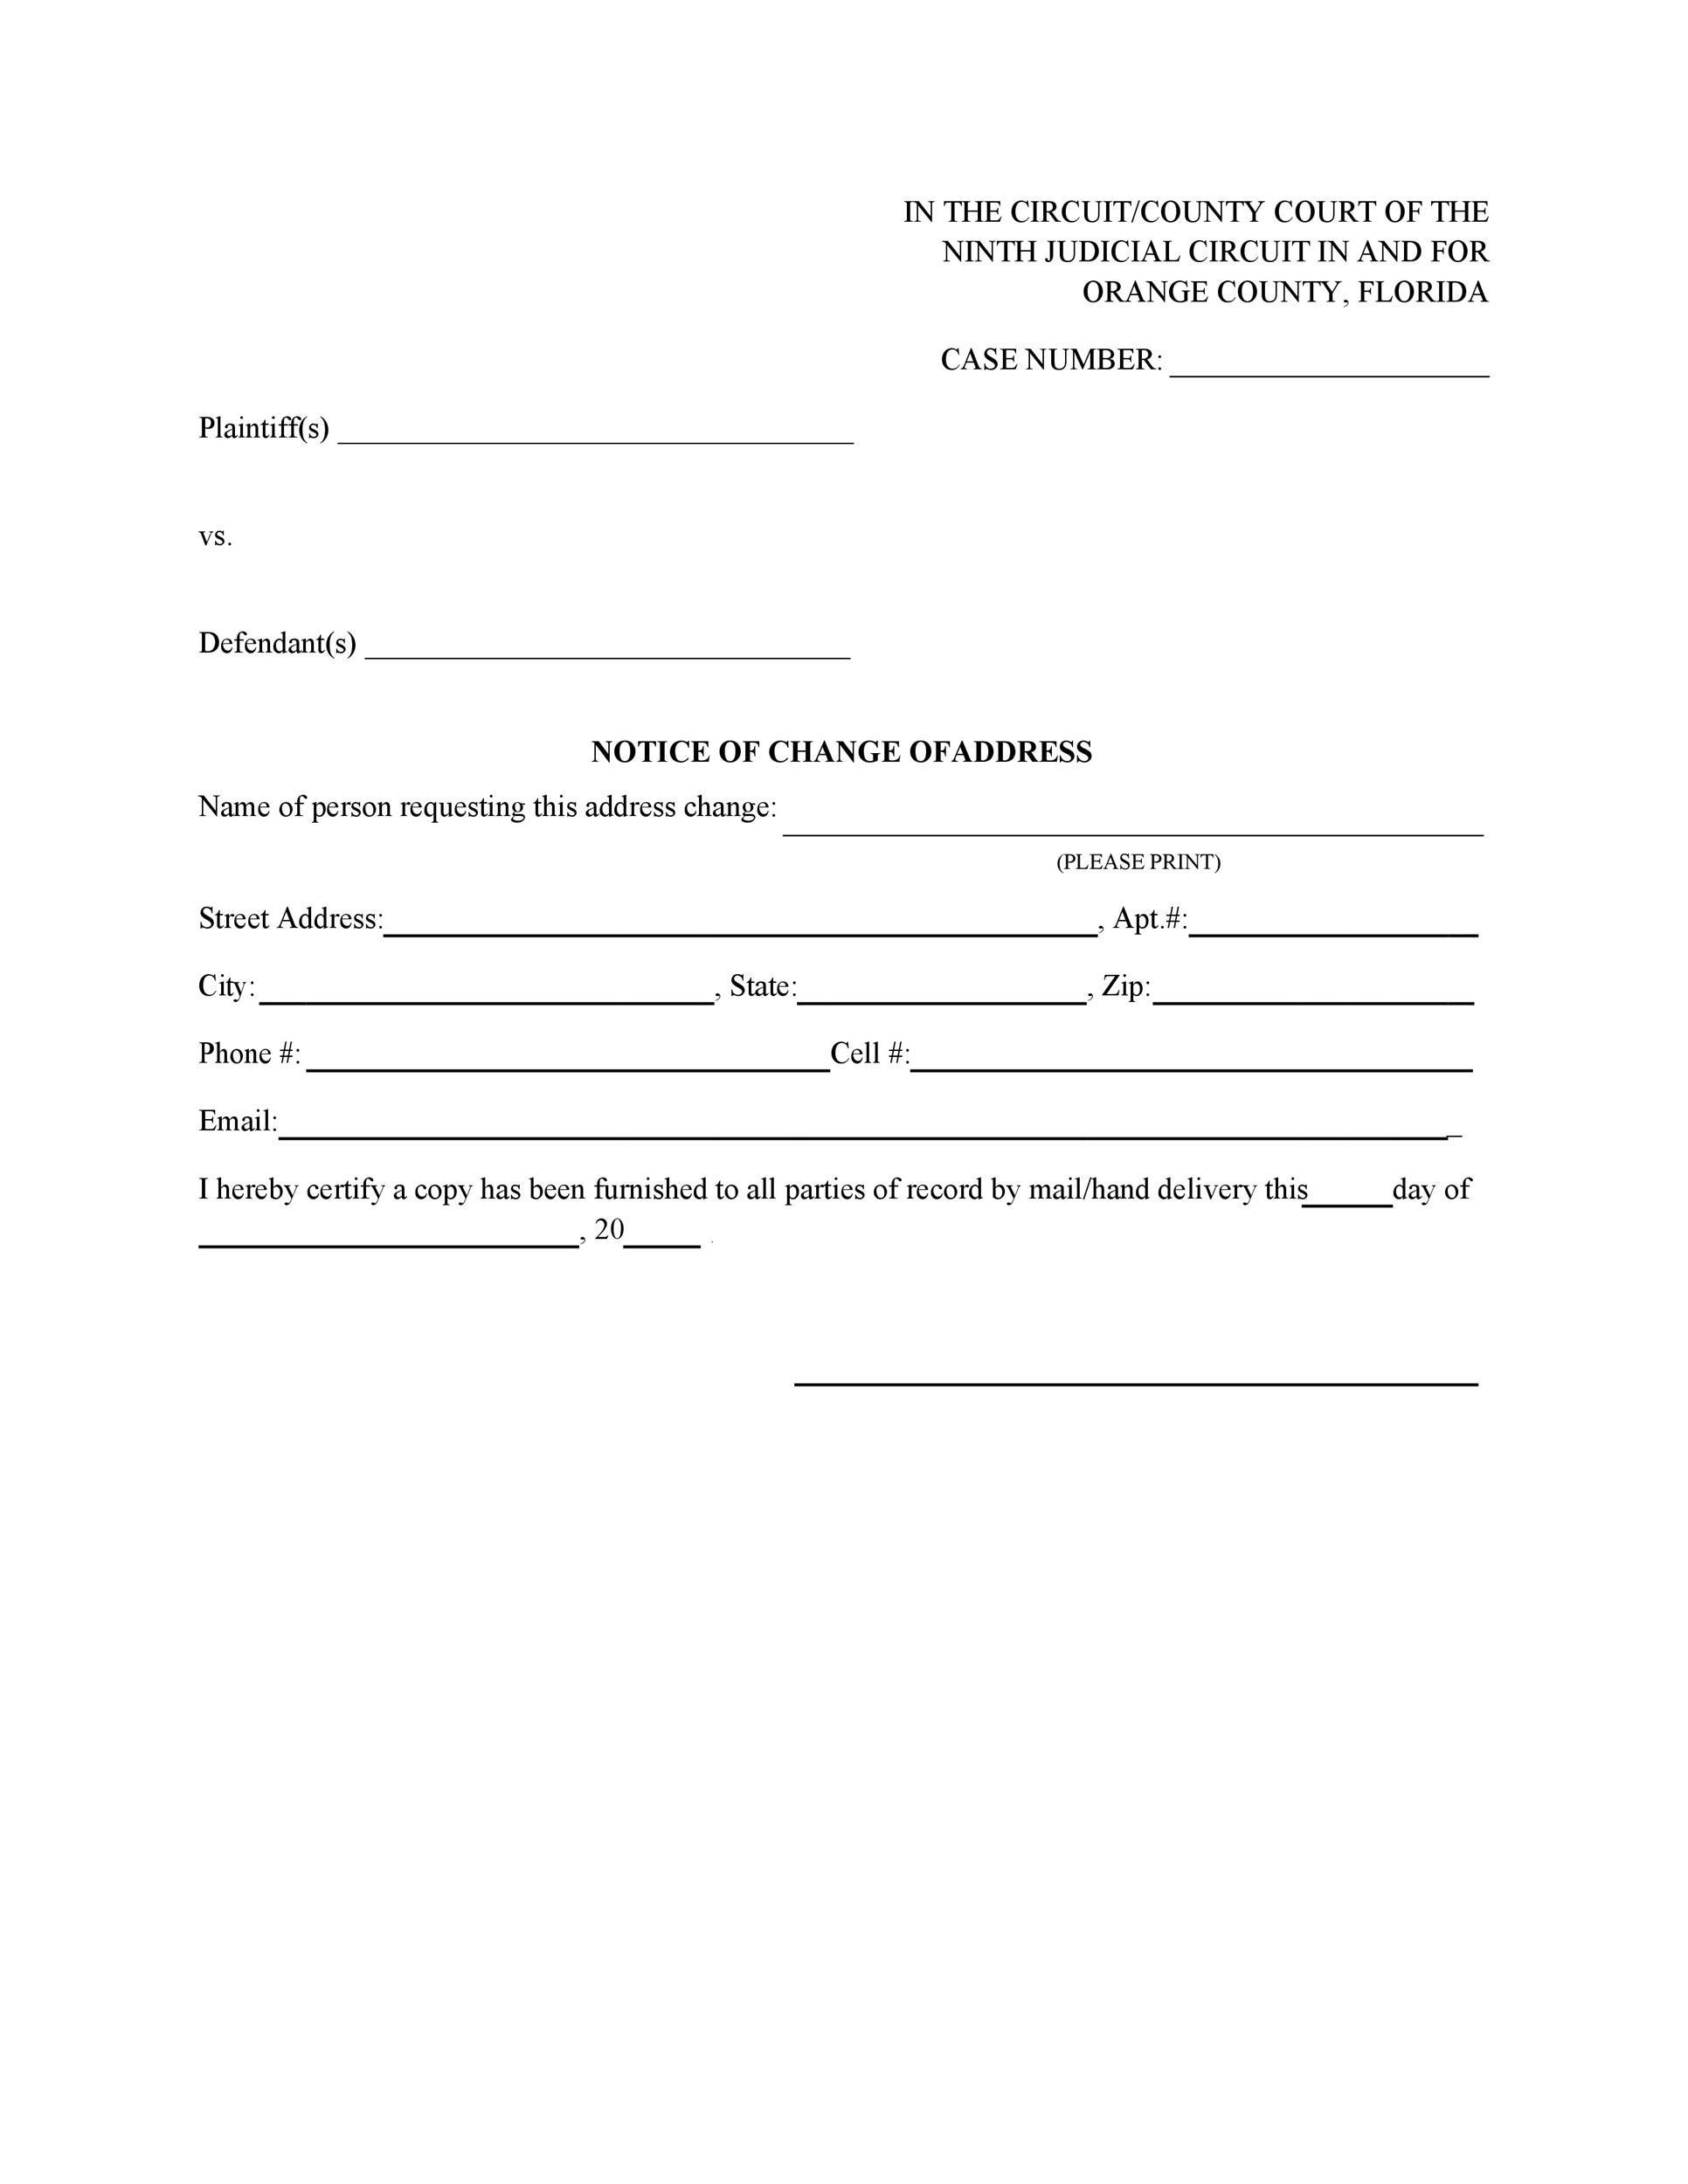 Free change of address letter 45